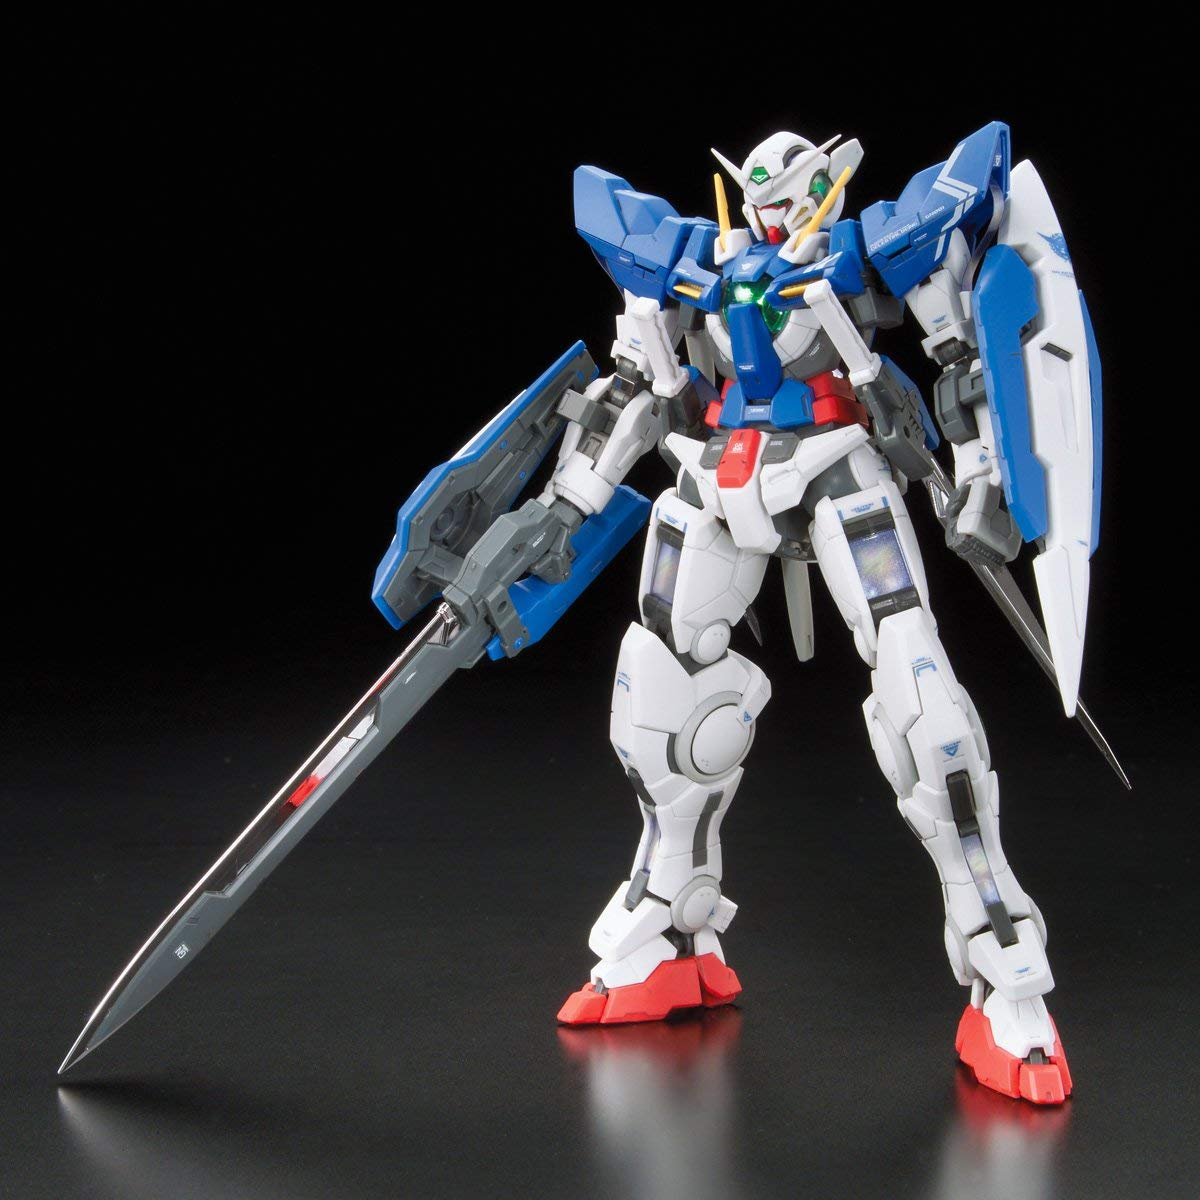 53566RG 1/144 GN-001 ガンダムエクシア [Gundam Exia]